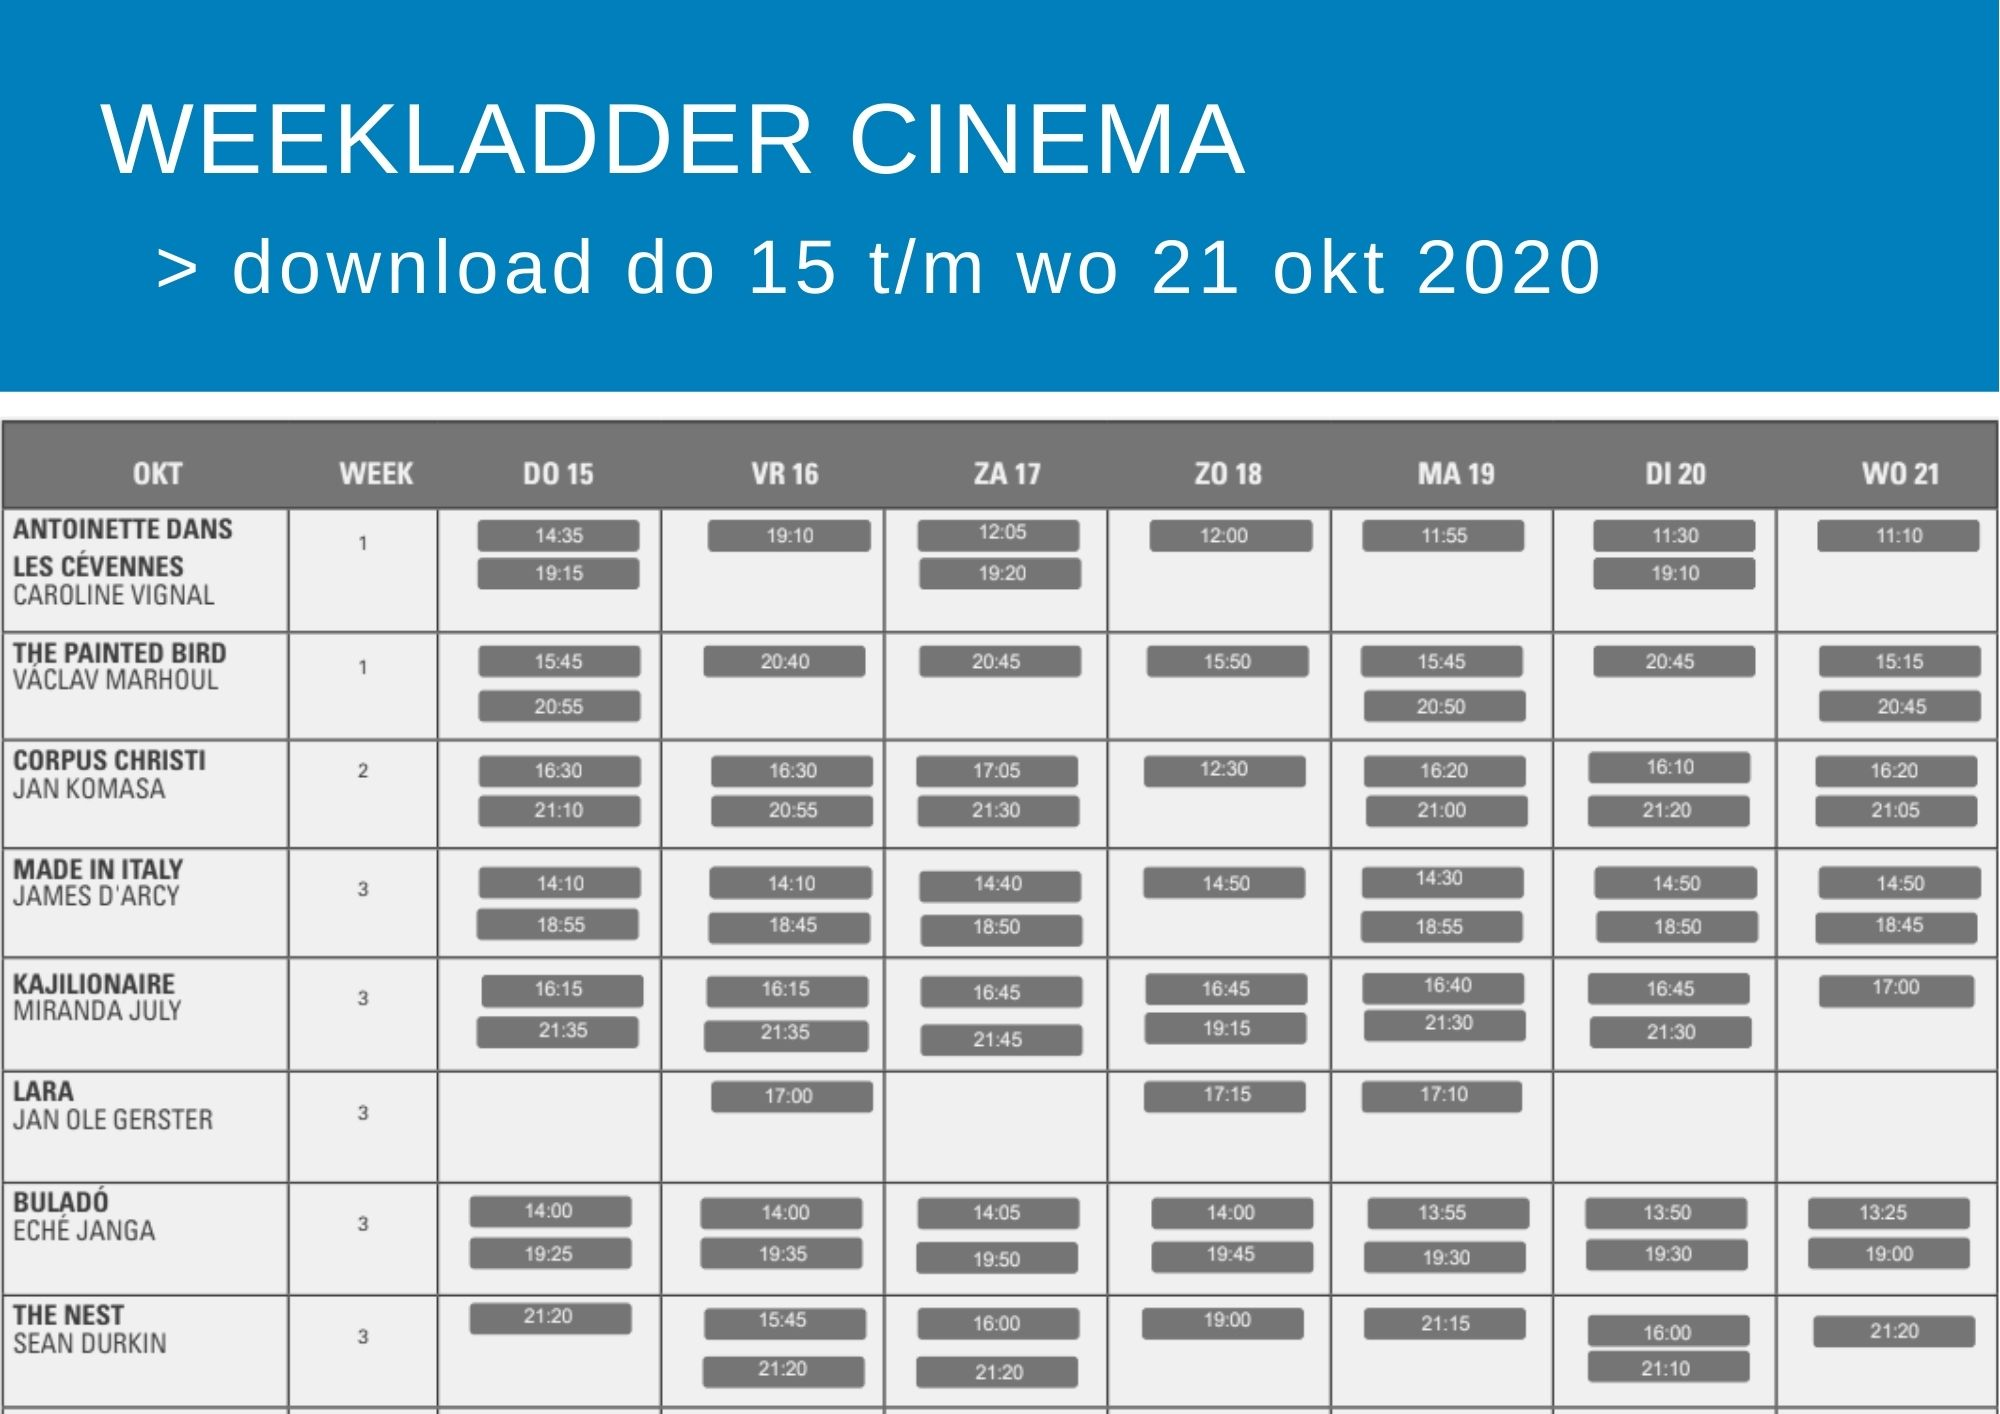 Cinema weekfolder